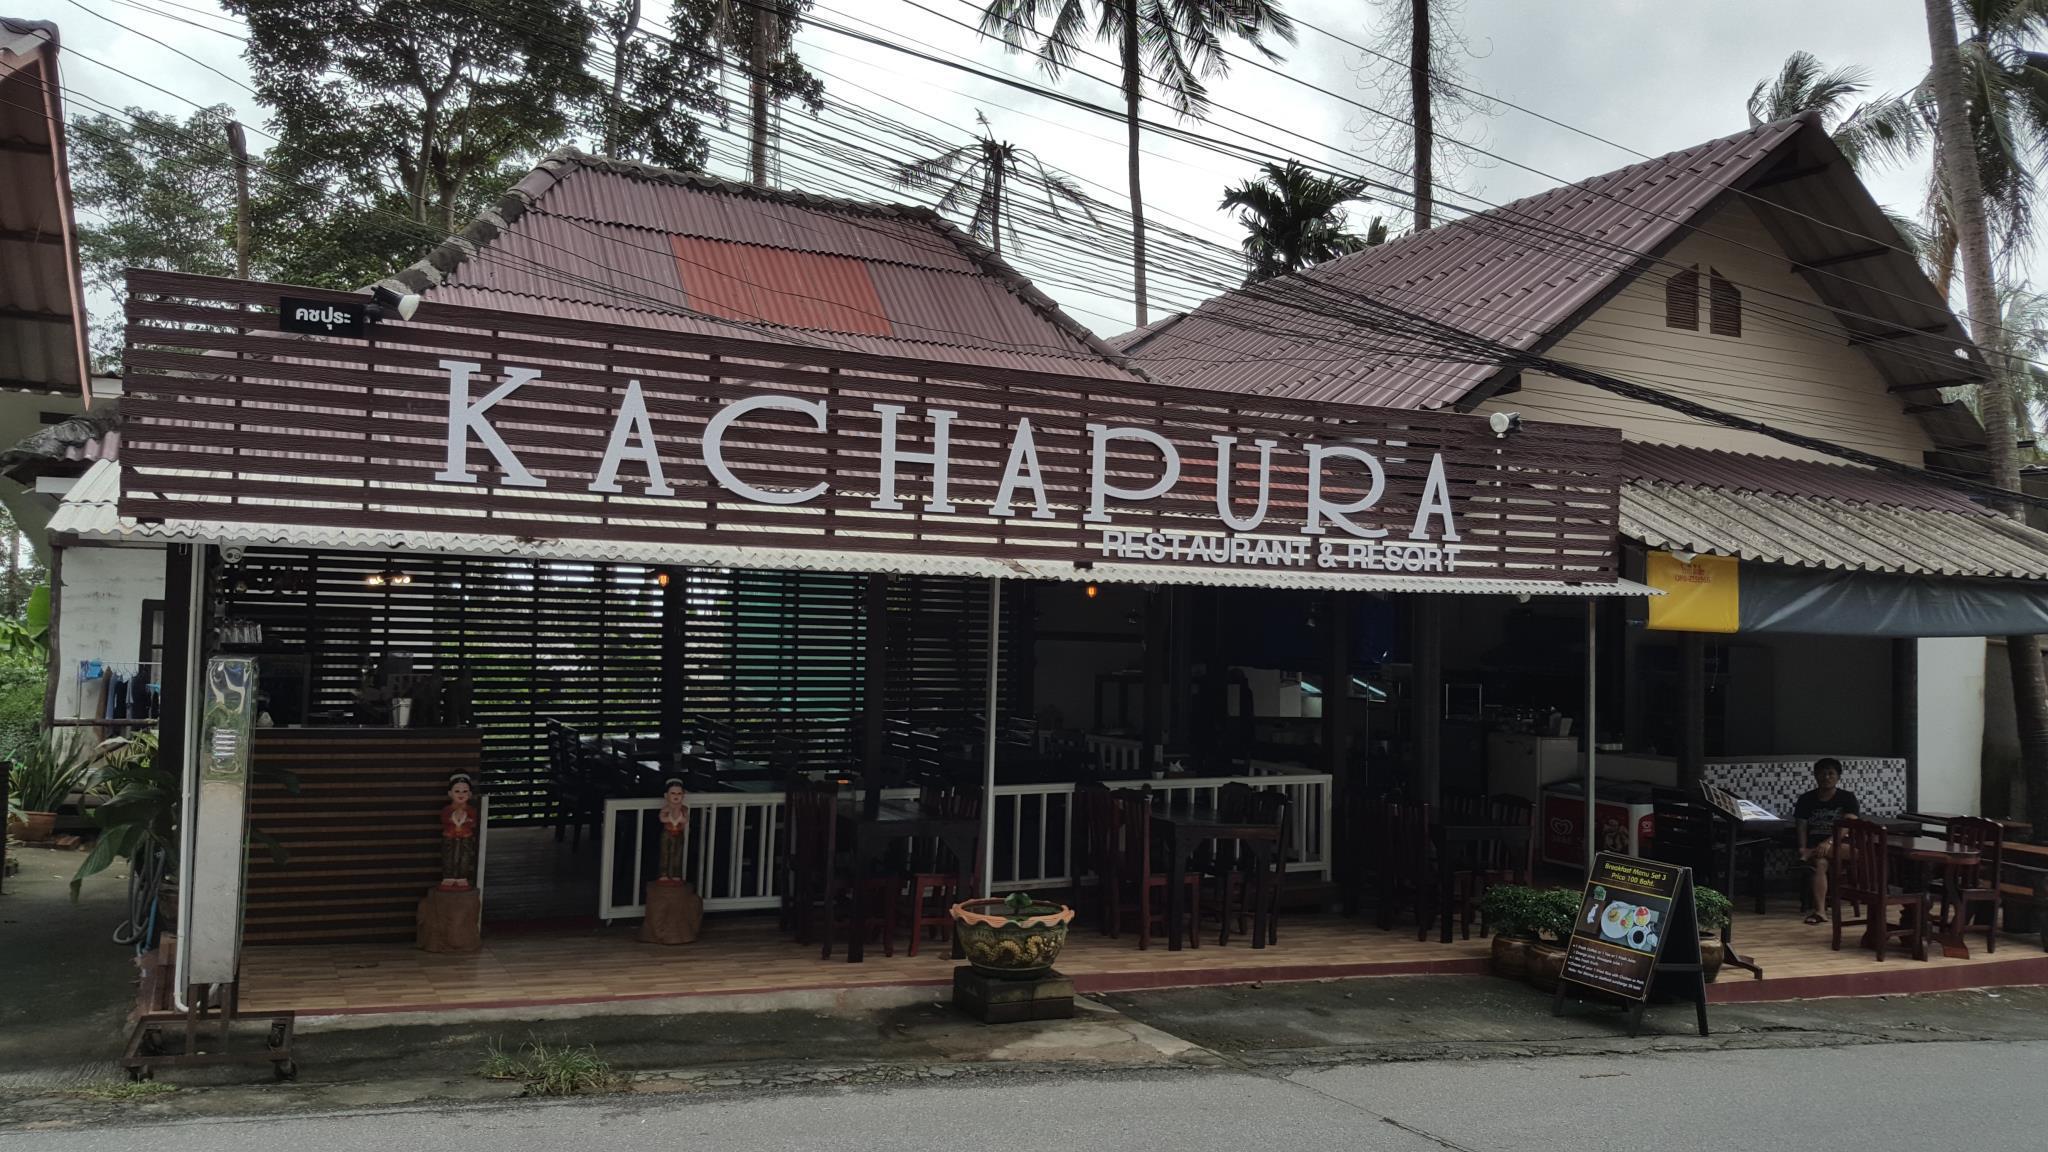 Kachapura